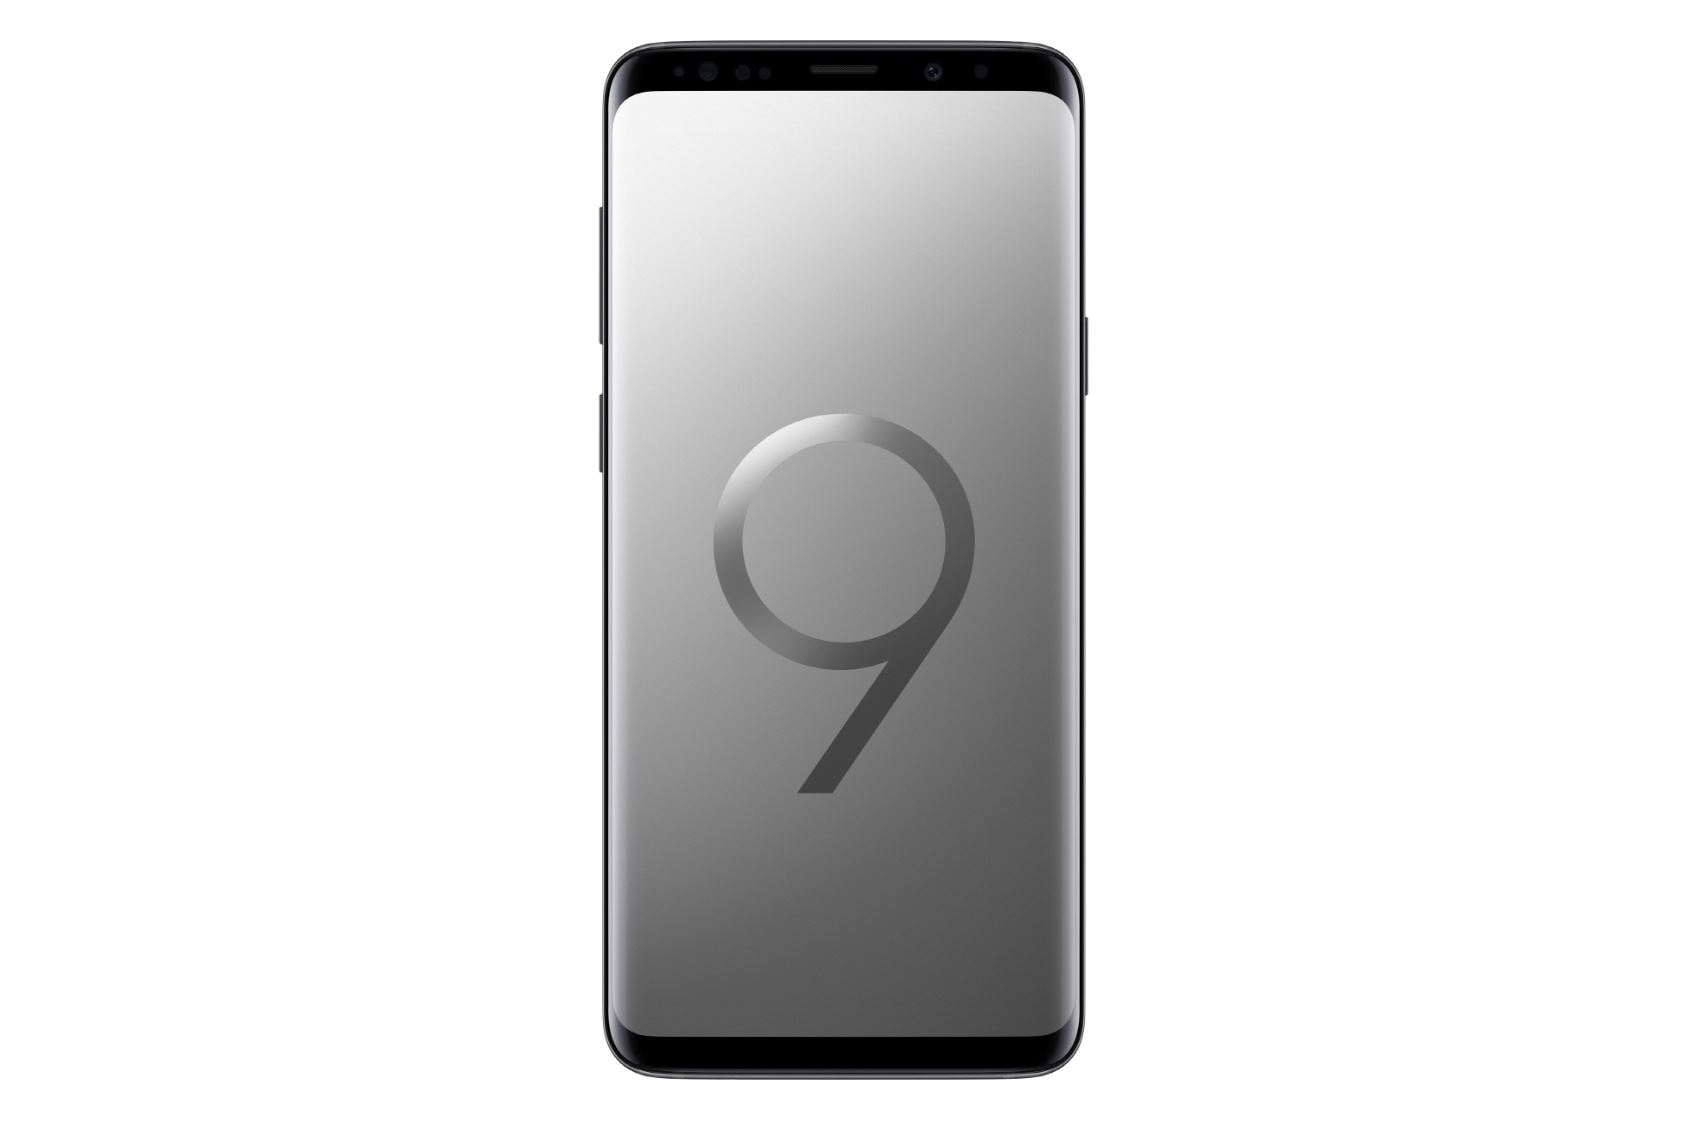 Preiskracher: Samsung Galaxy S9 fällt tief im Preis